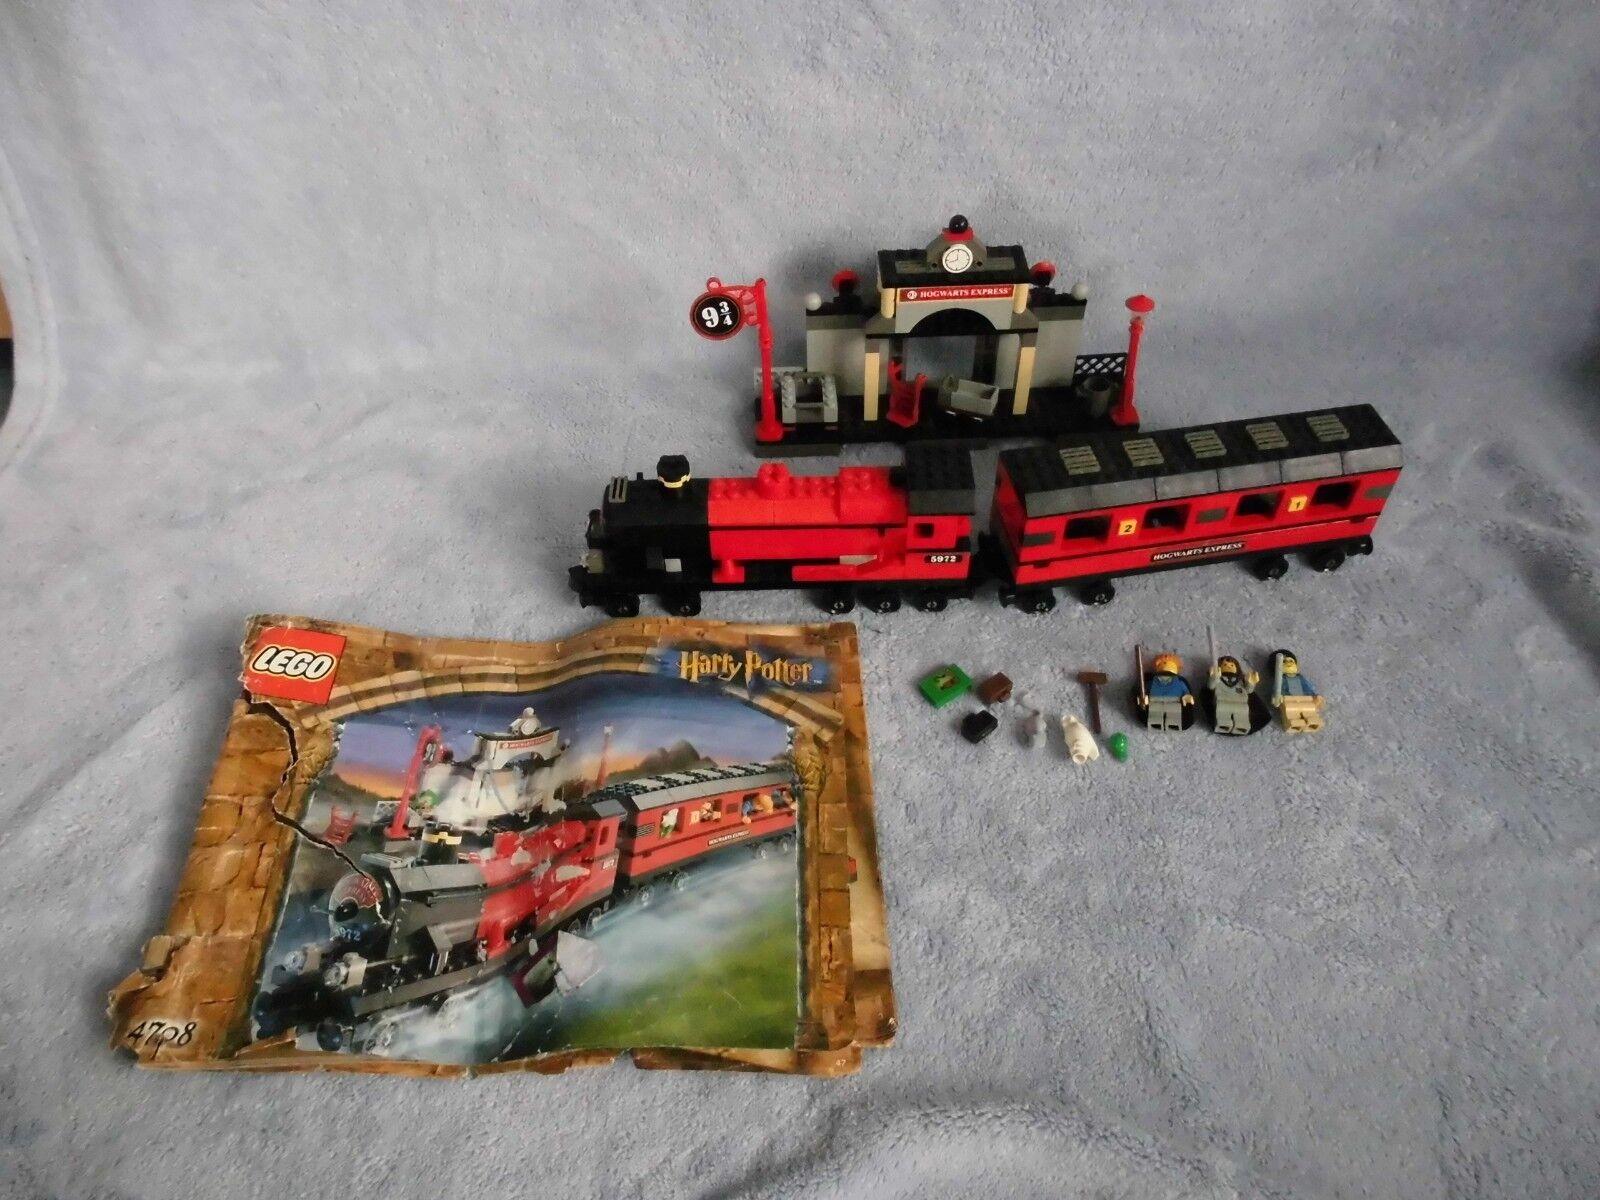 Lego-Harry Potter -  4708-Poudlard Express Gare  distribution globale